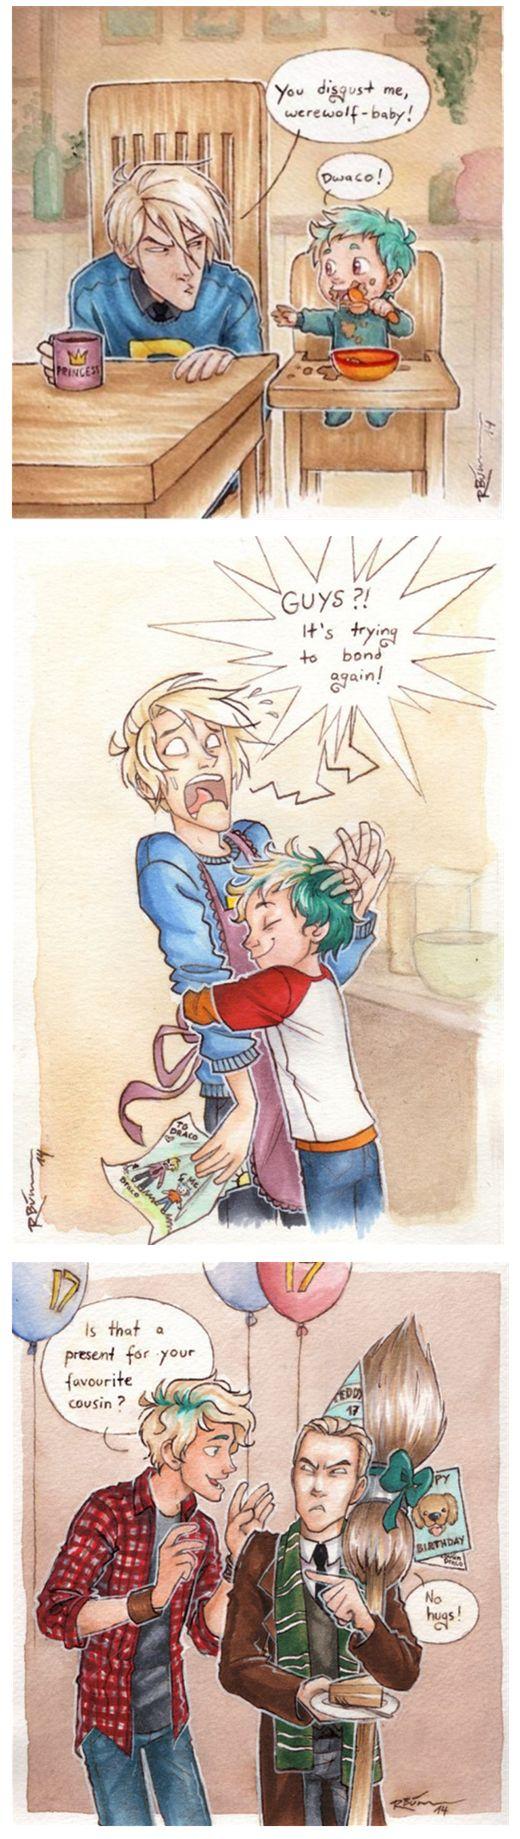 Draco and Teddy (Draco wears a Weasley sweater!) ... draco malfidus, harry potter, teddy lupin, draco, malfidus, teddy, lupin